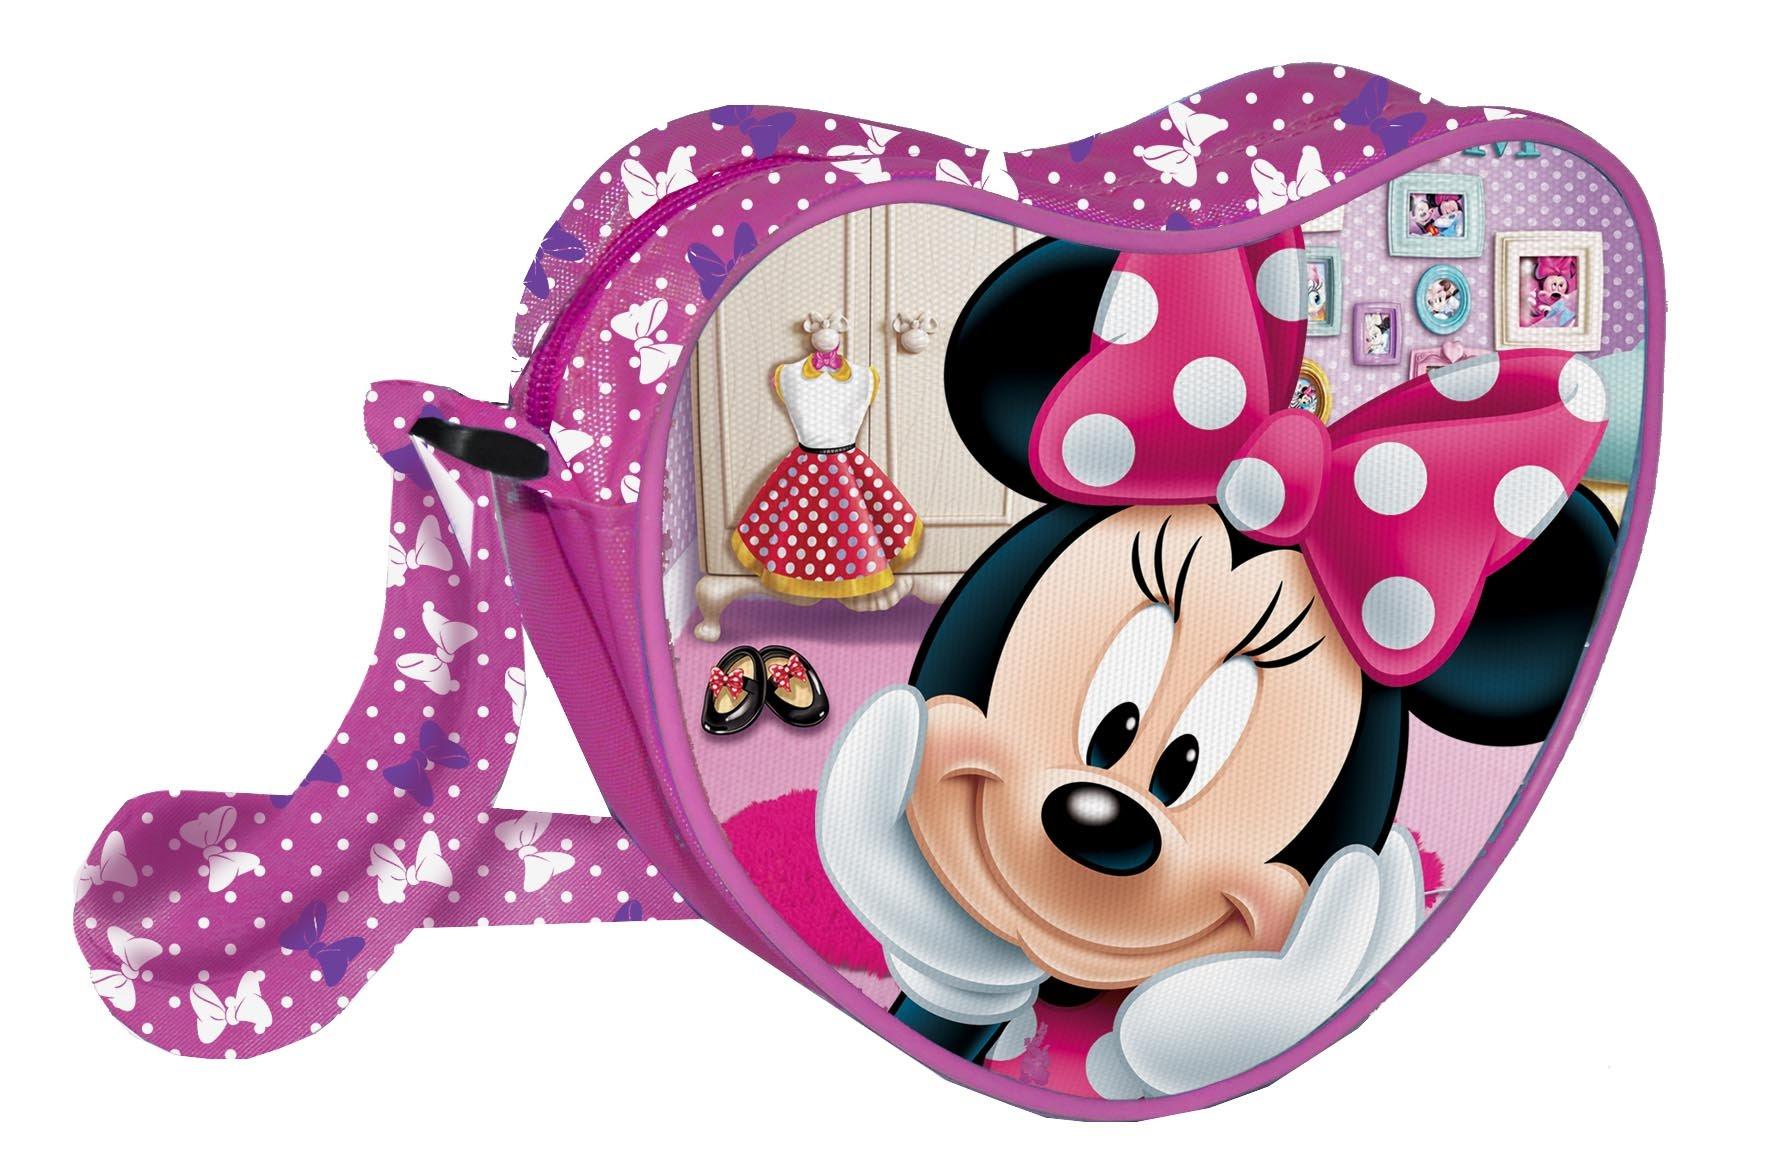 Coriex PINK BOW 迪士尼米妮 HEART 单肩包 儿童运动包,18 厘米,多色